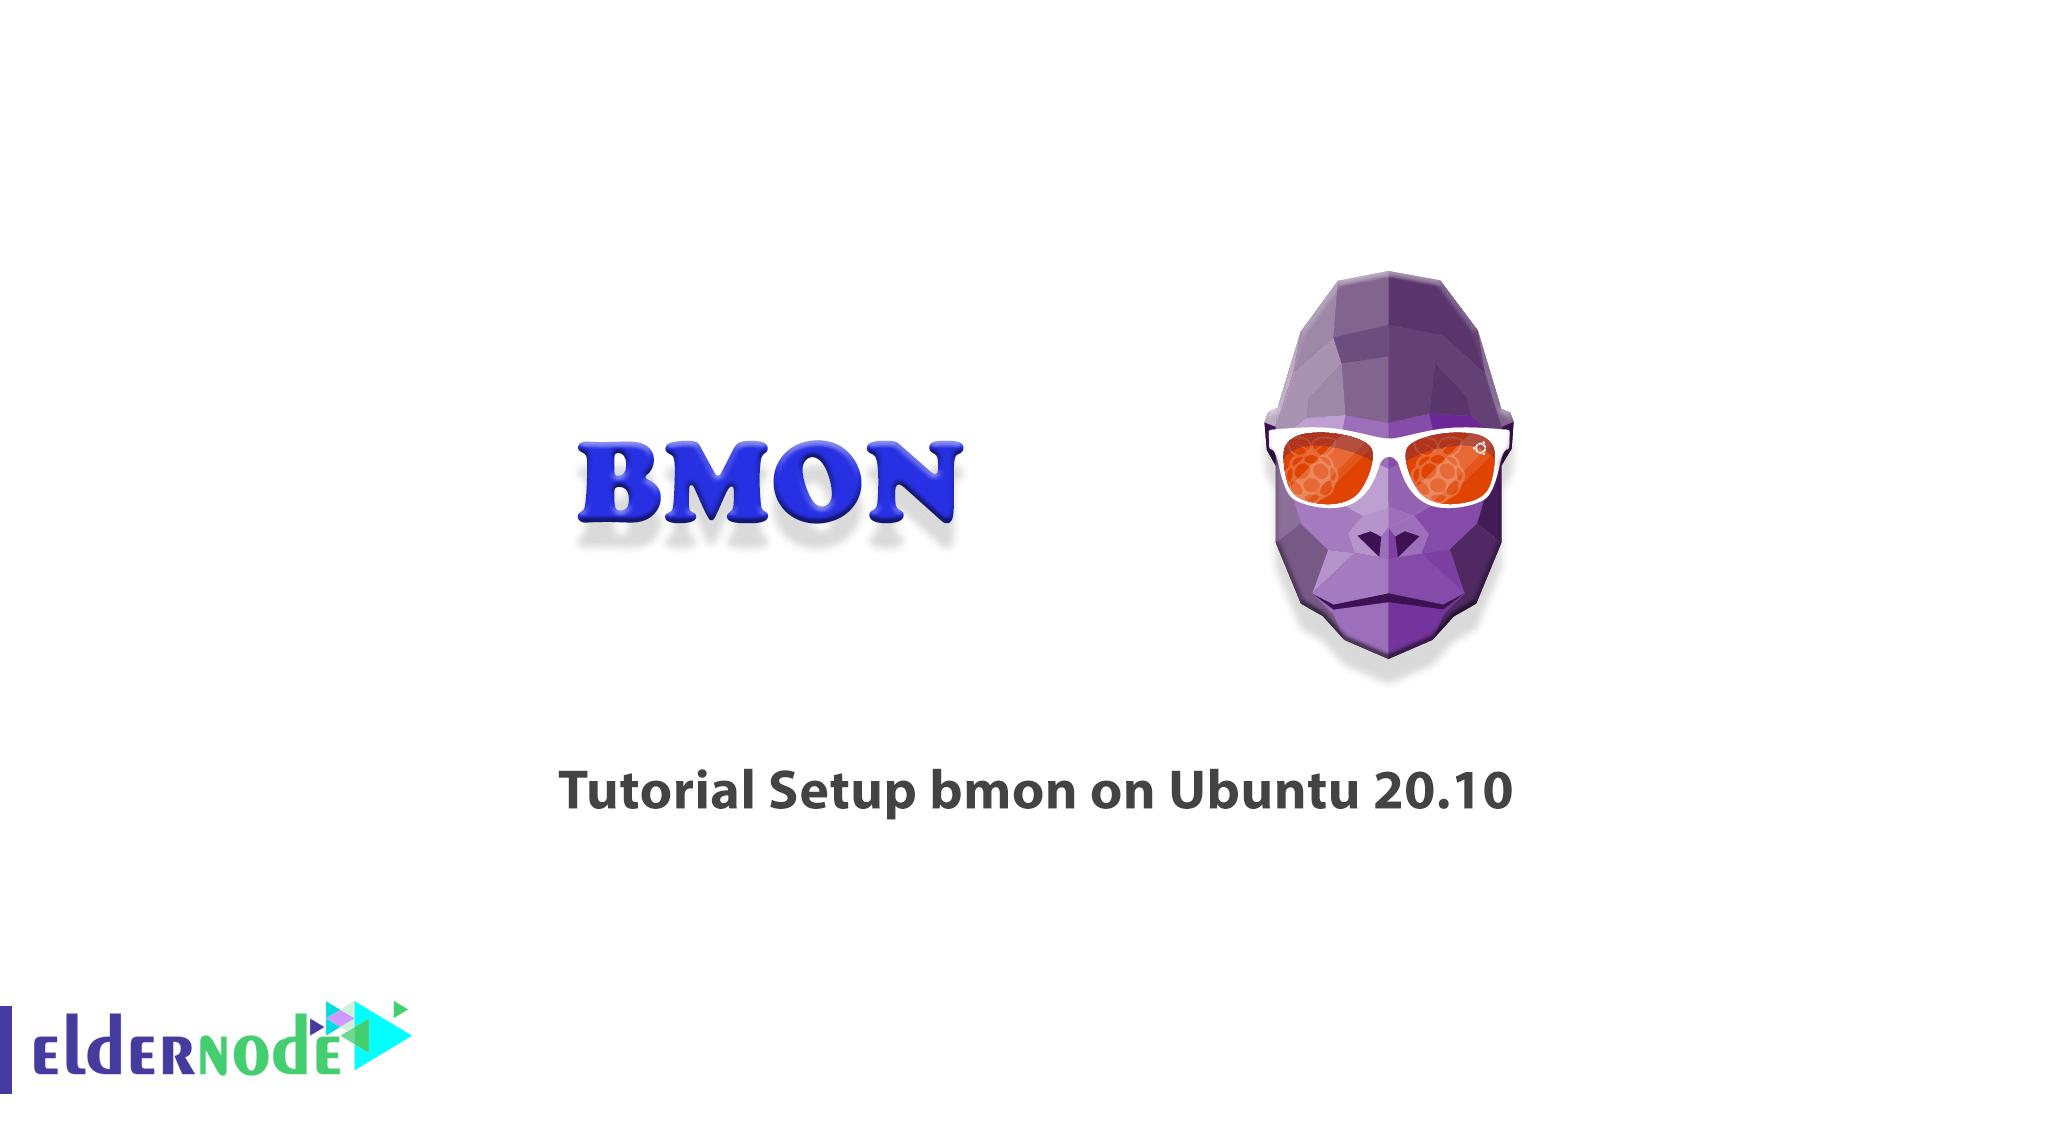 Tutorial Setup bmon on Ubuntu 20.10